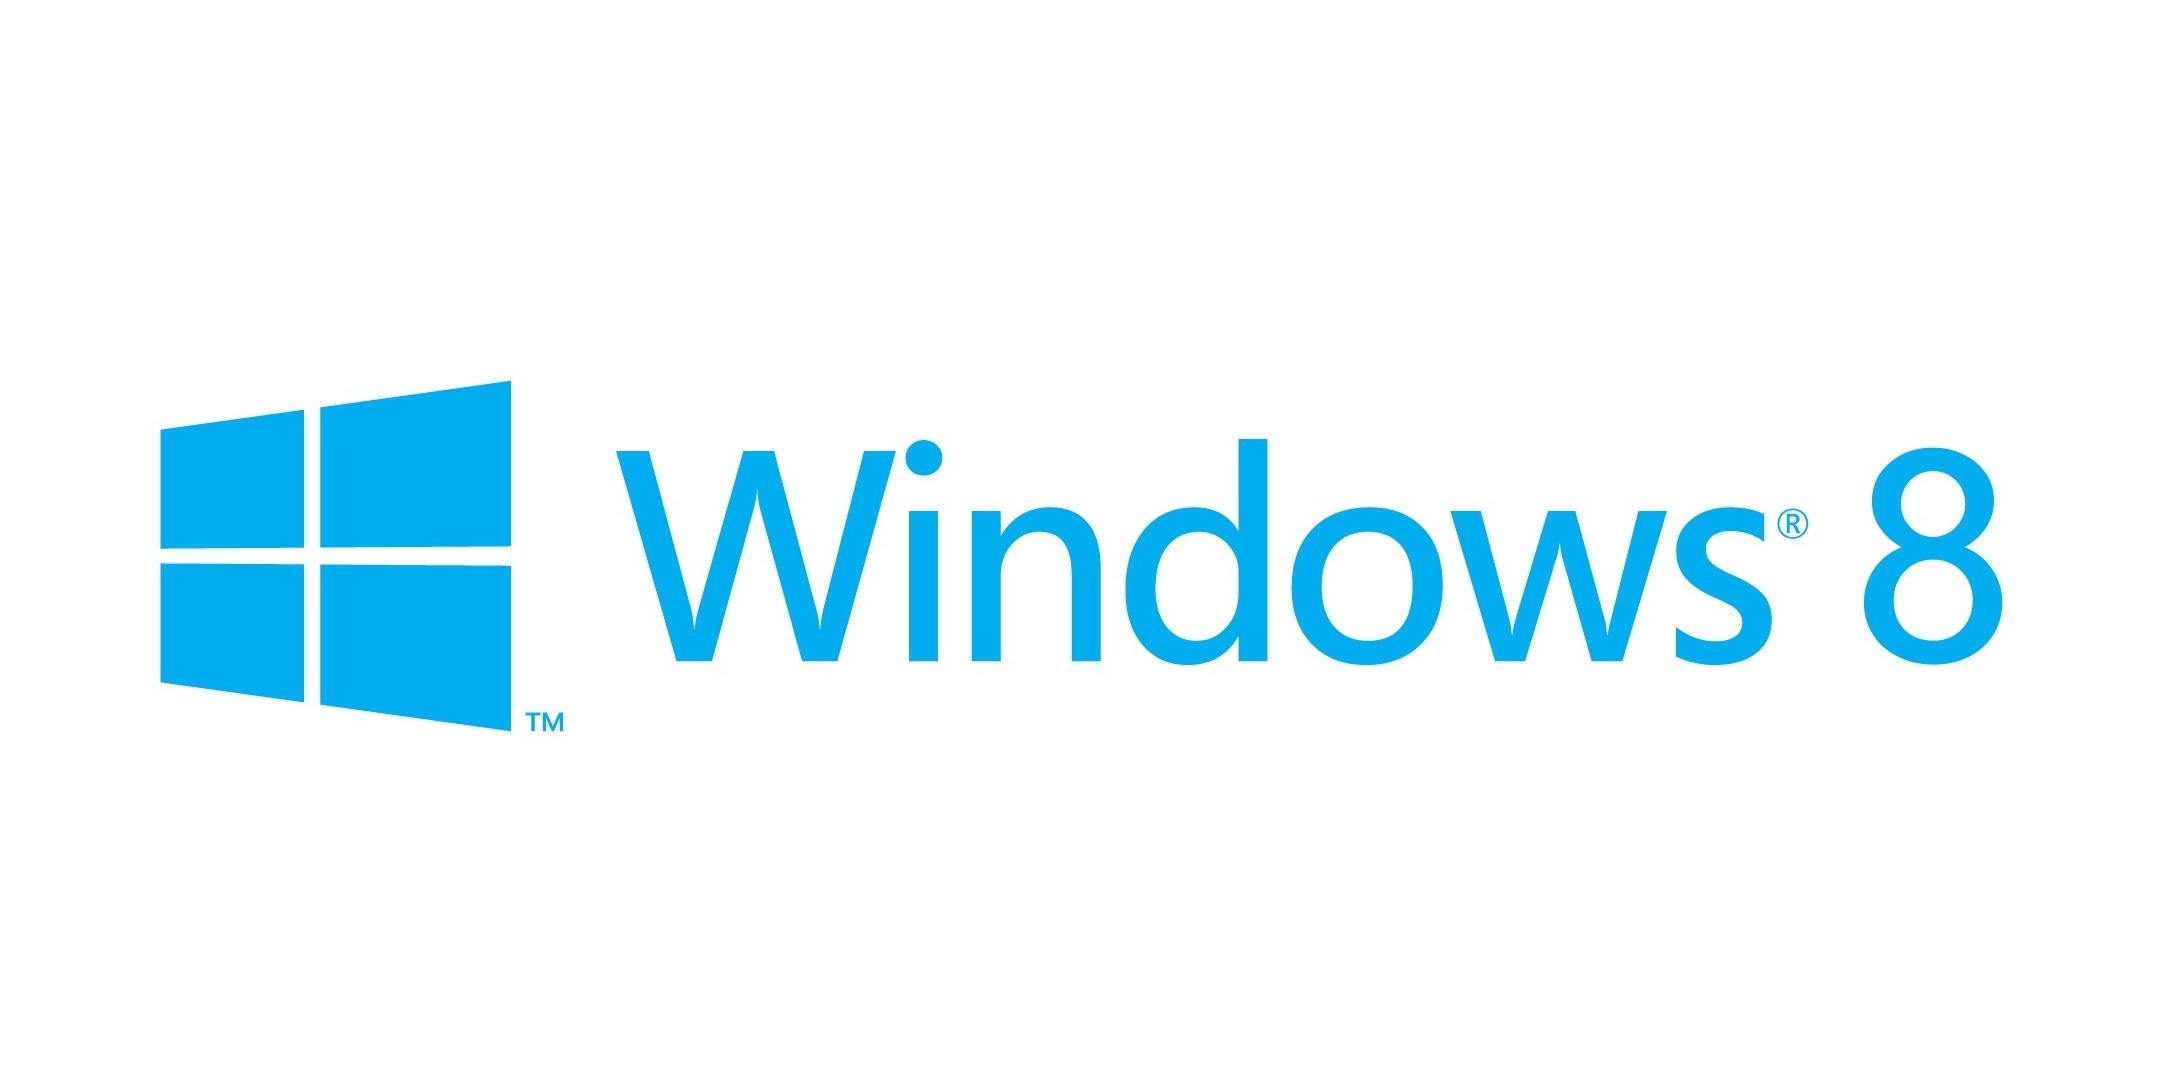 windows-8-logo-wallpaper-171